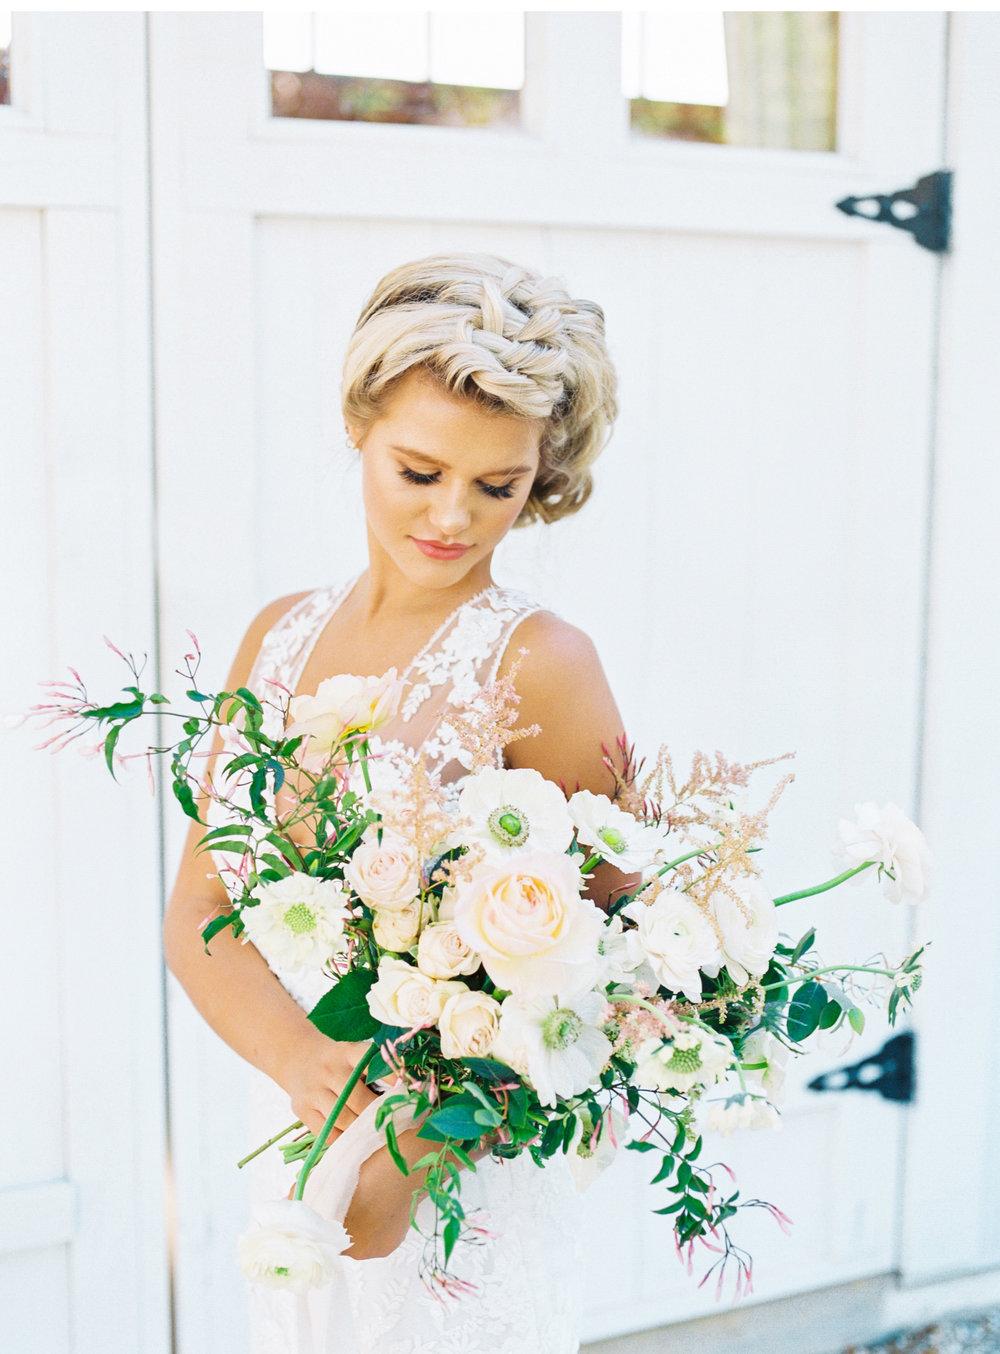 San-Luis-Obispo-Weddings-Natalie-Schutt-Wedding-Photography_10.jpg